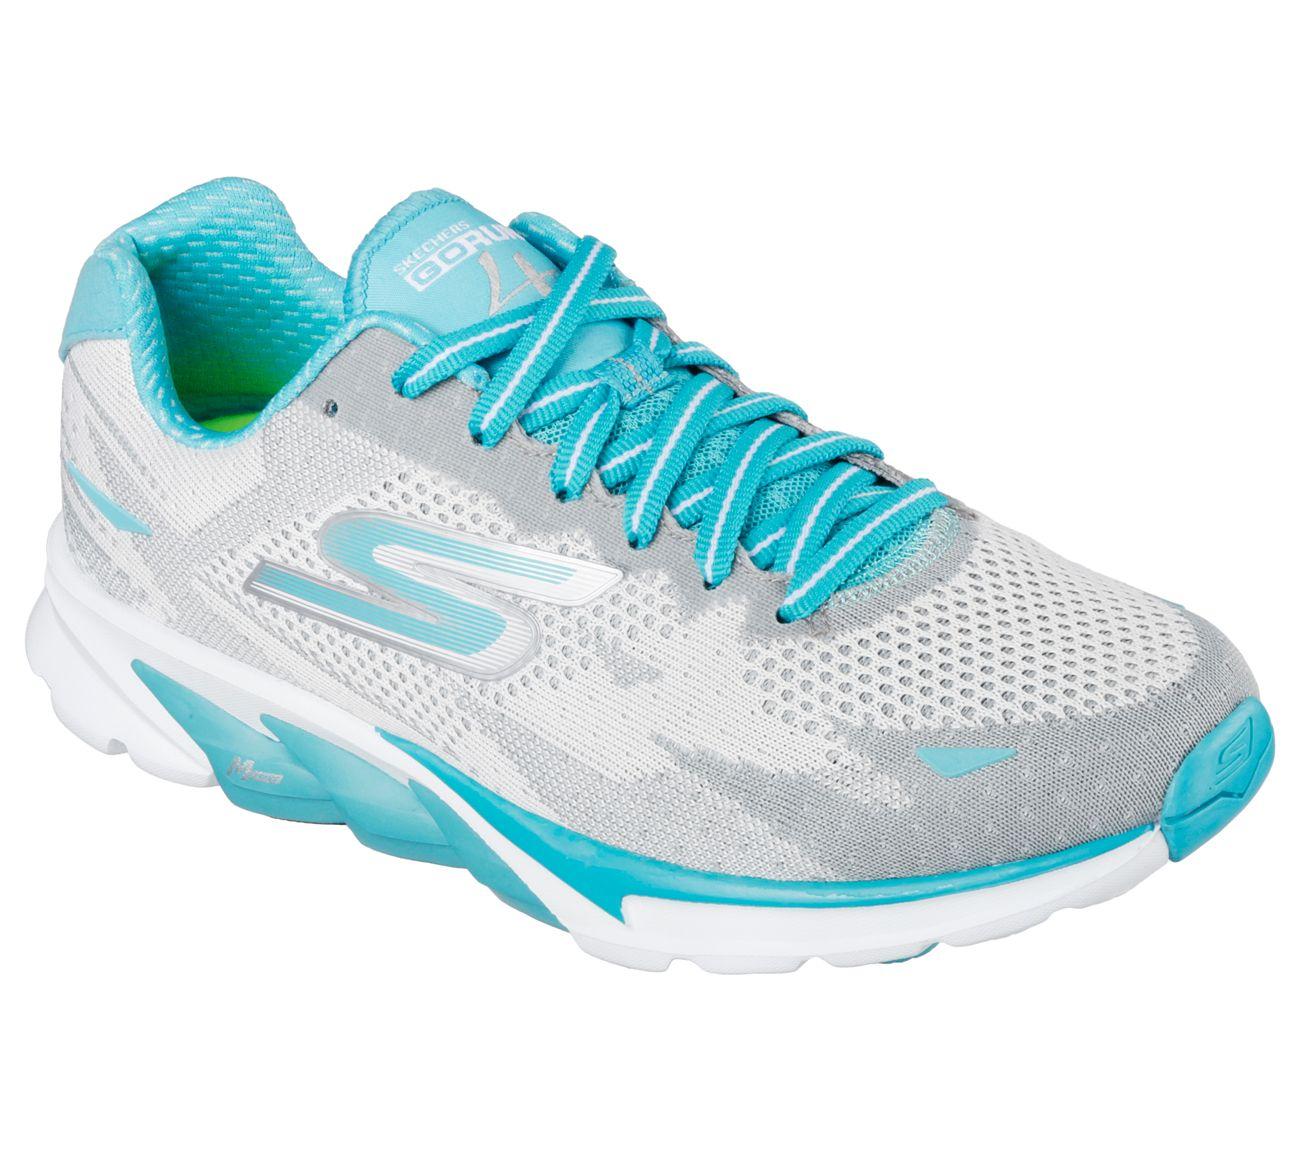 bronce Opcional Culpa  Skechers GOrun 4 - 2016 | Running shoes design, Running shoes, Womens  running shoes